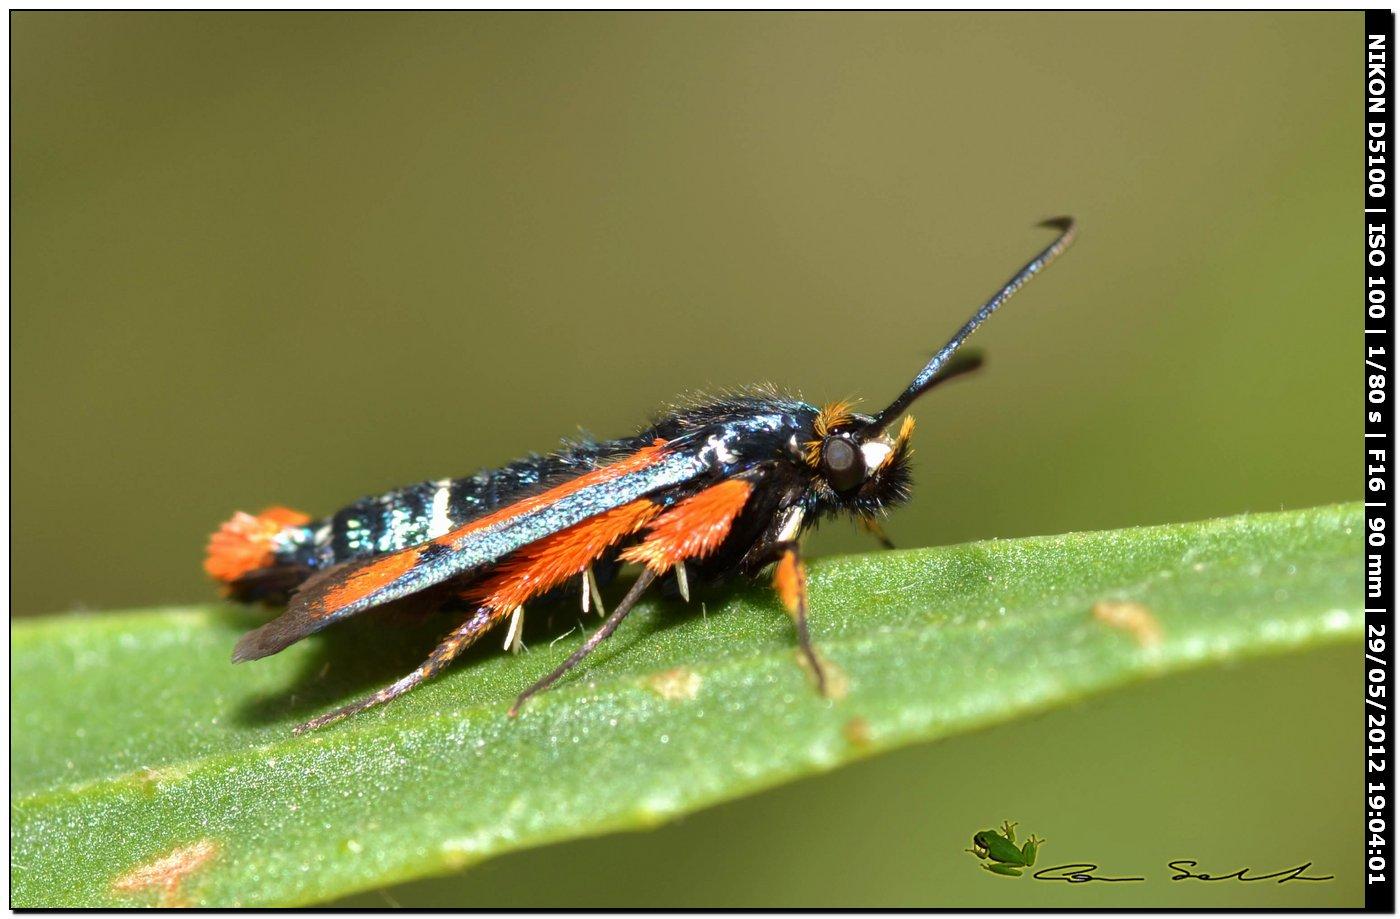 Pyropteron chrysidiforme, Sesiidae